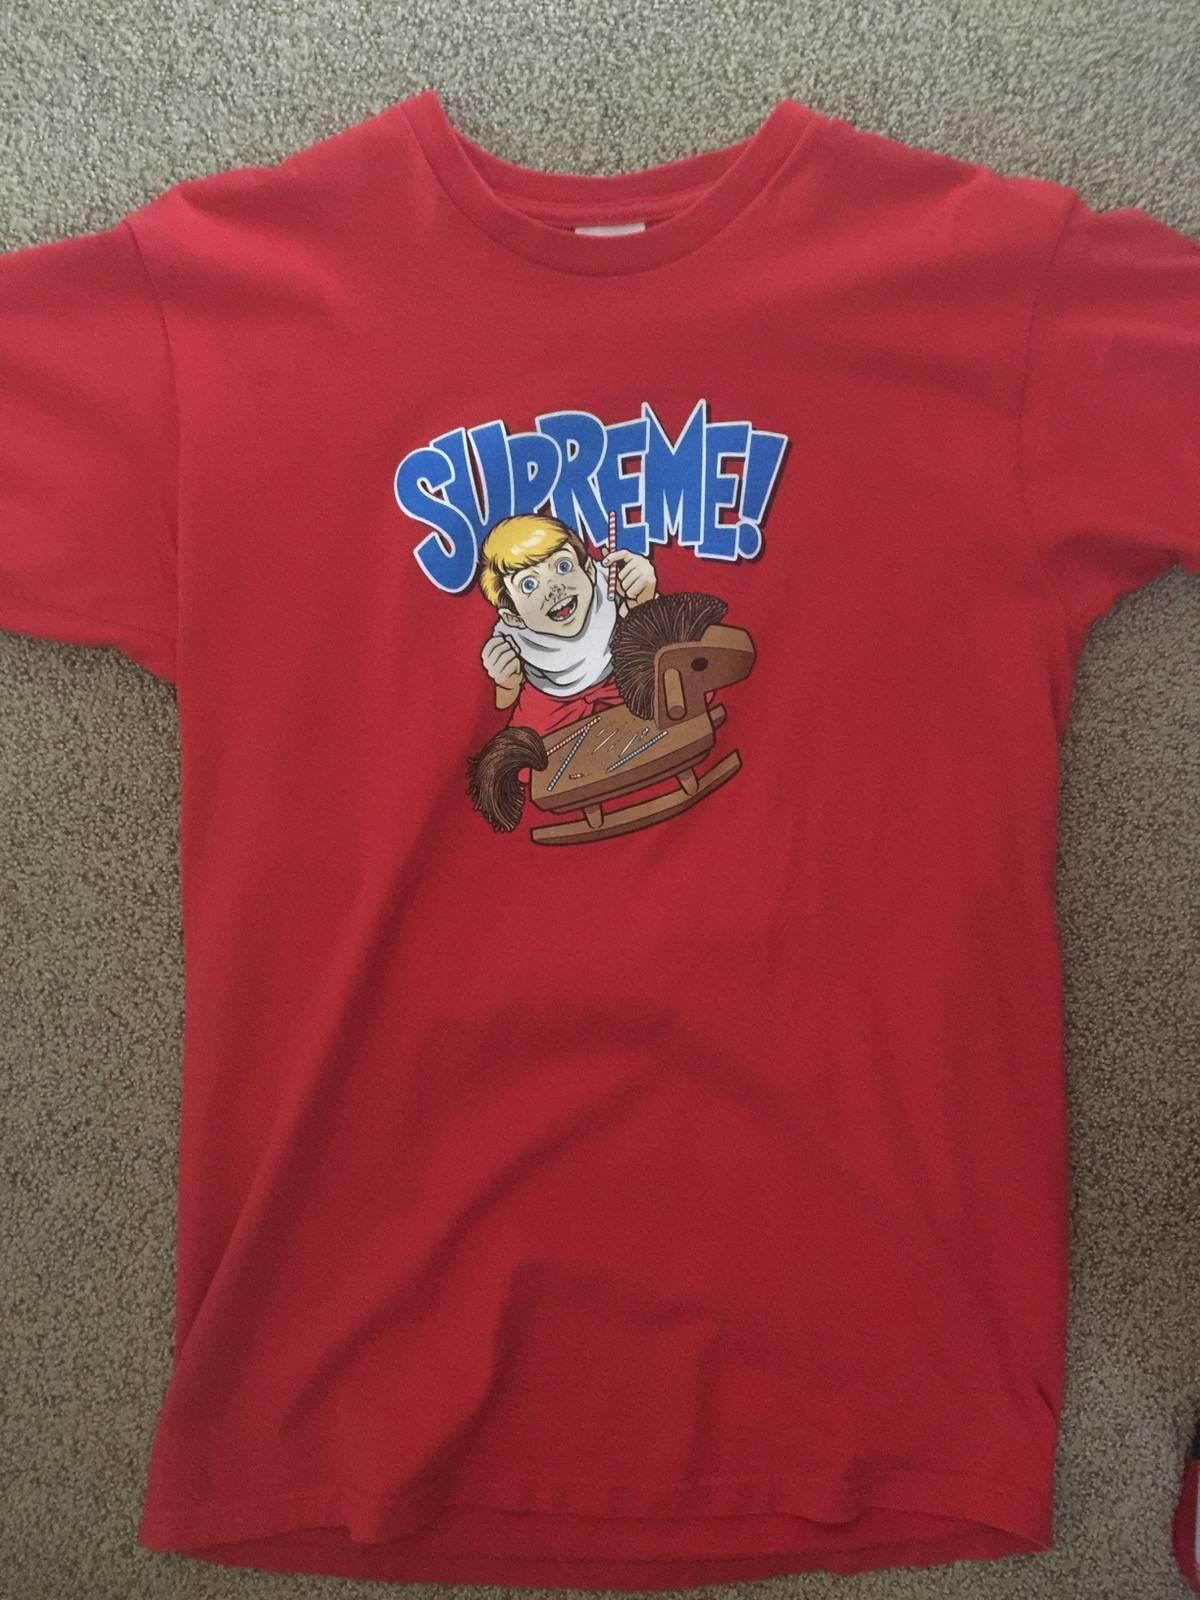 Supreme Sean Cliver Sugar Rush Rocking Horse | Grailed